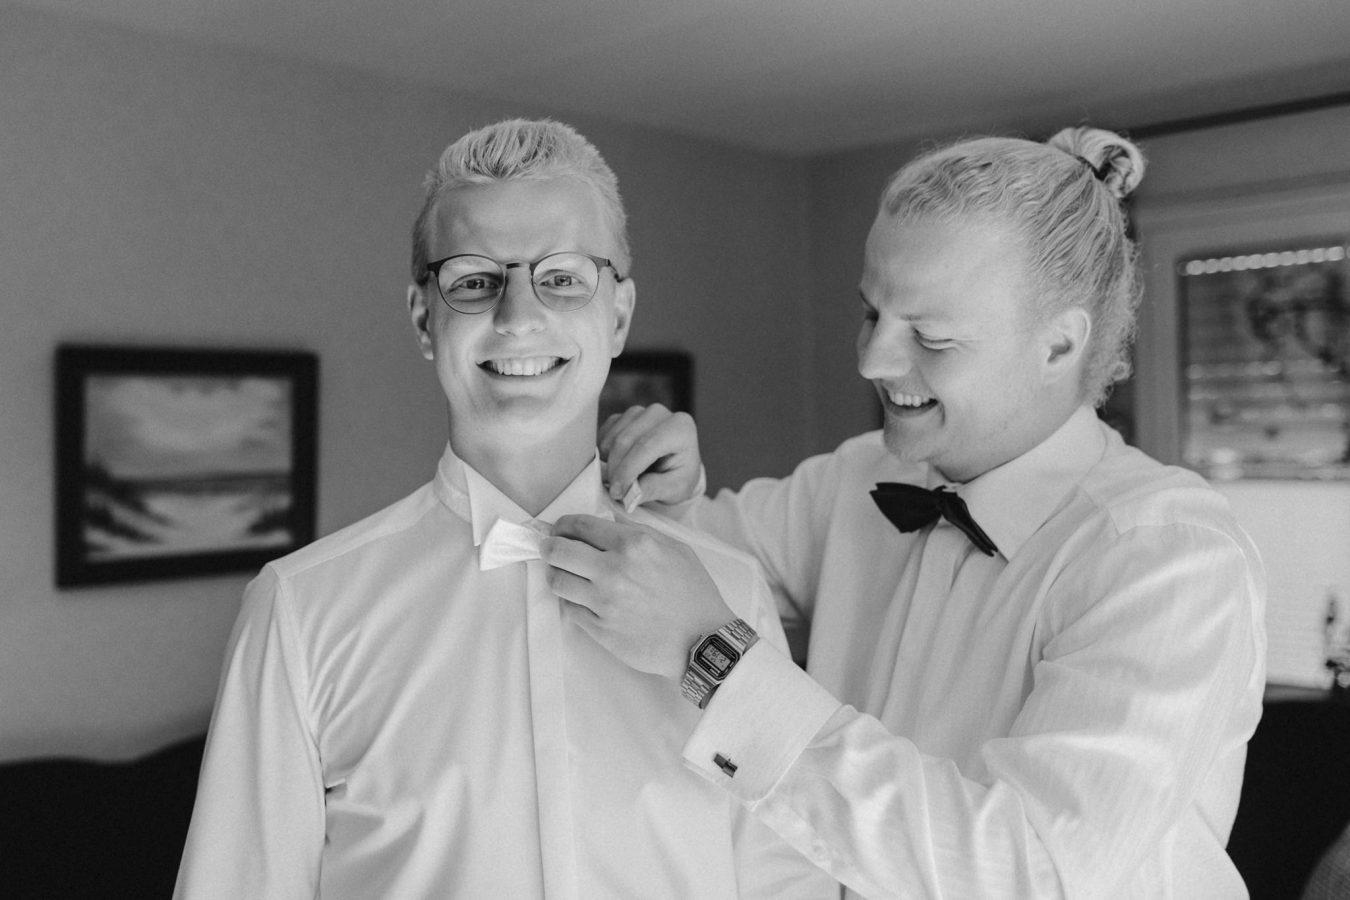 Getting Ready: der Trauzeuge hilft dem Bräutigam